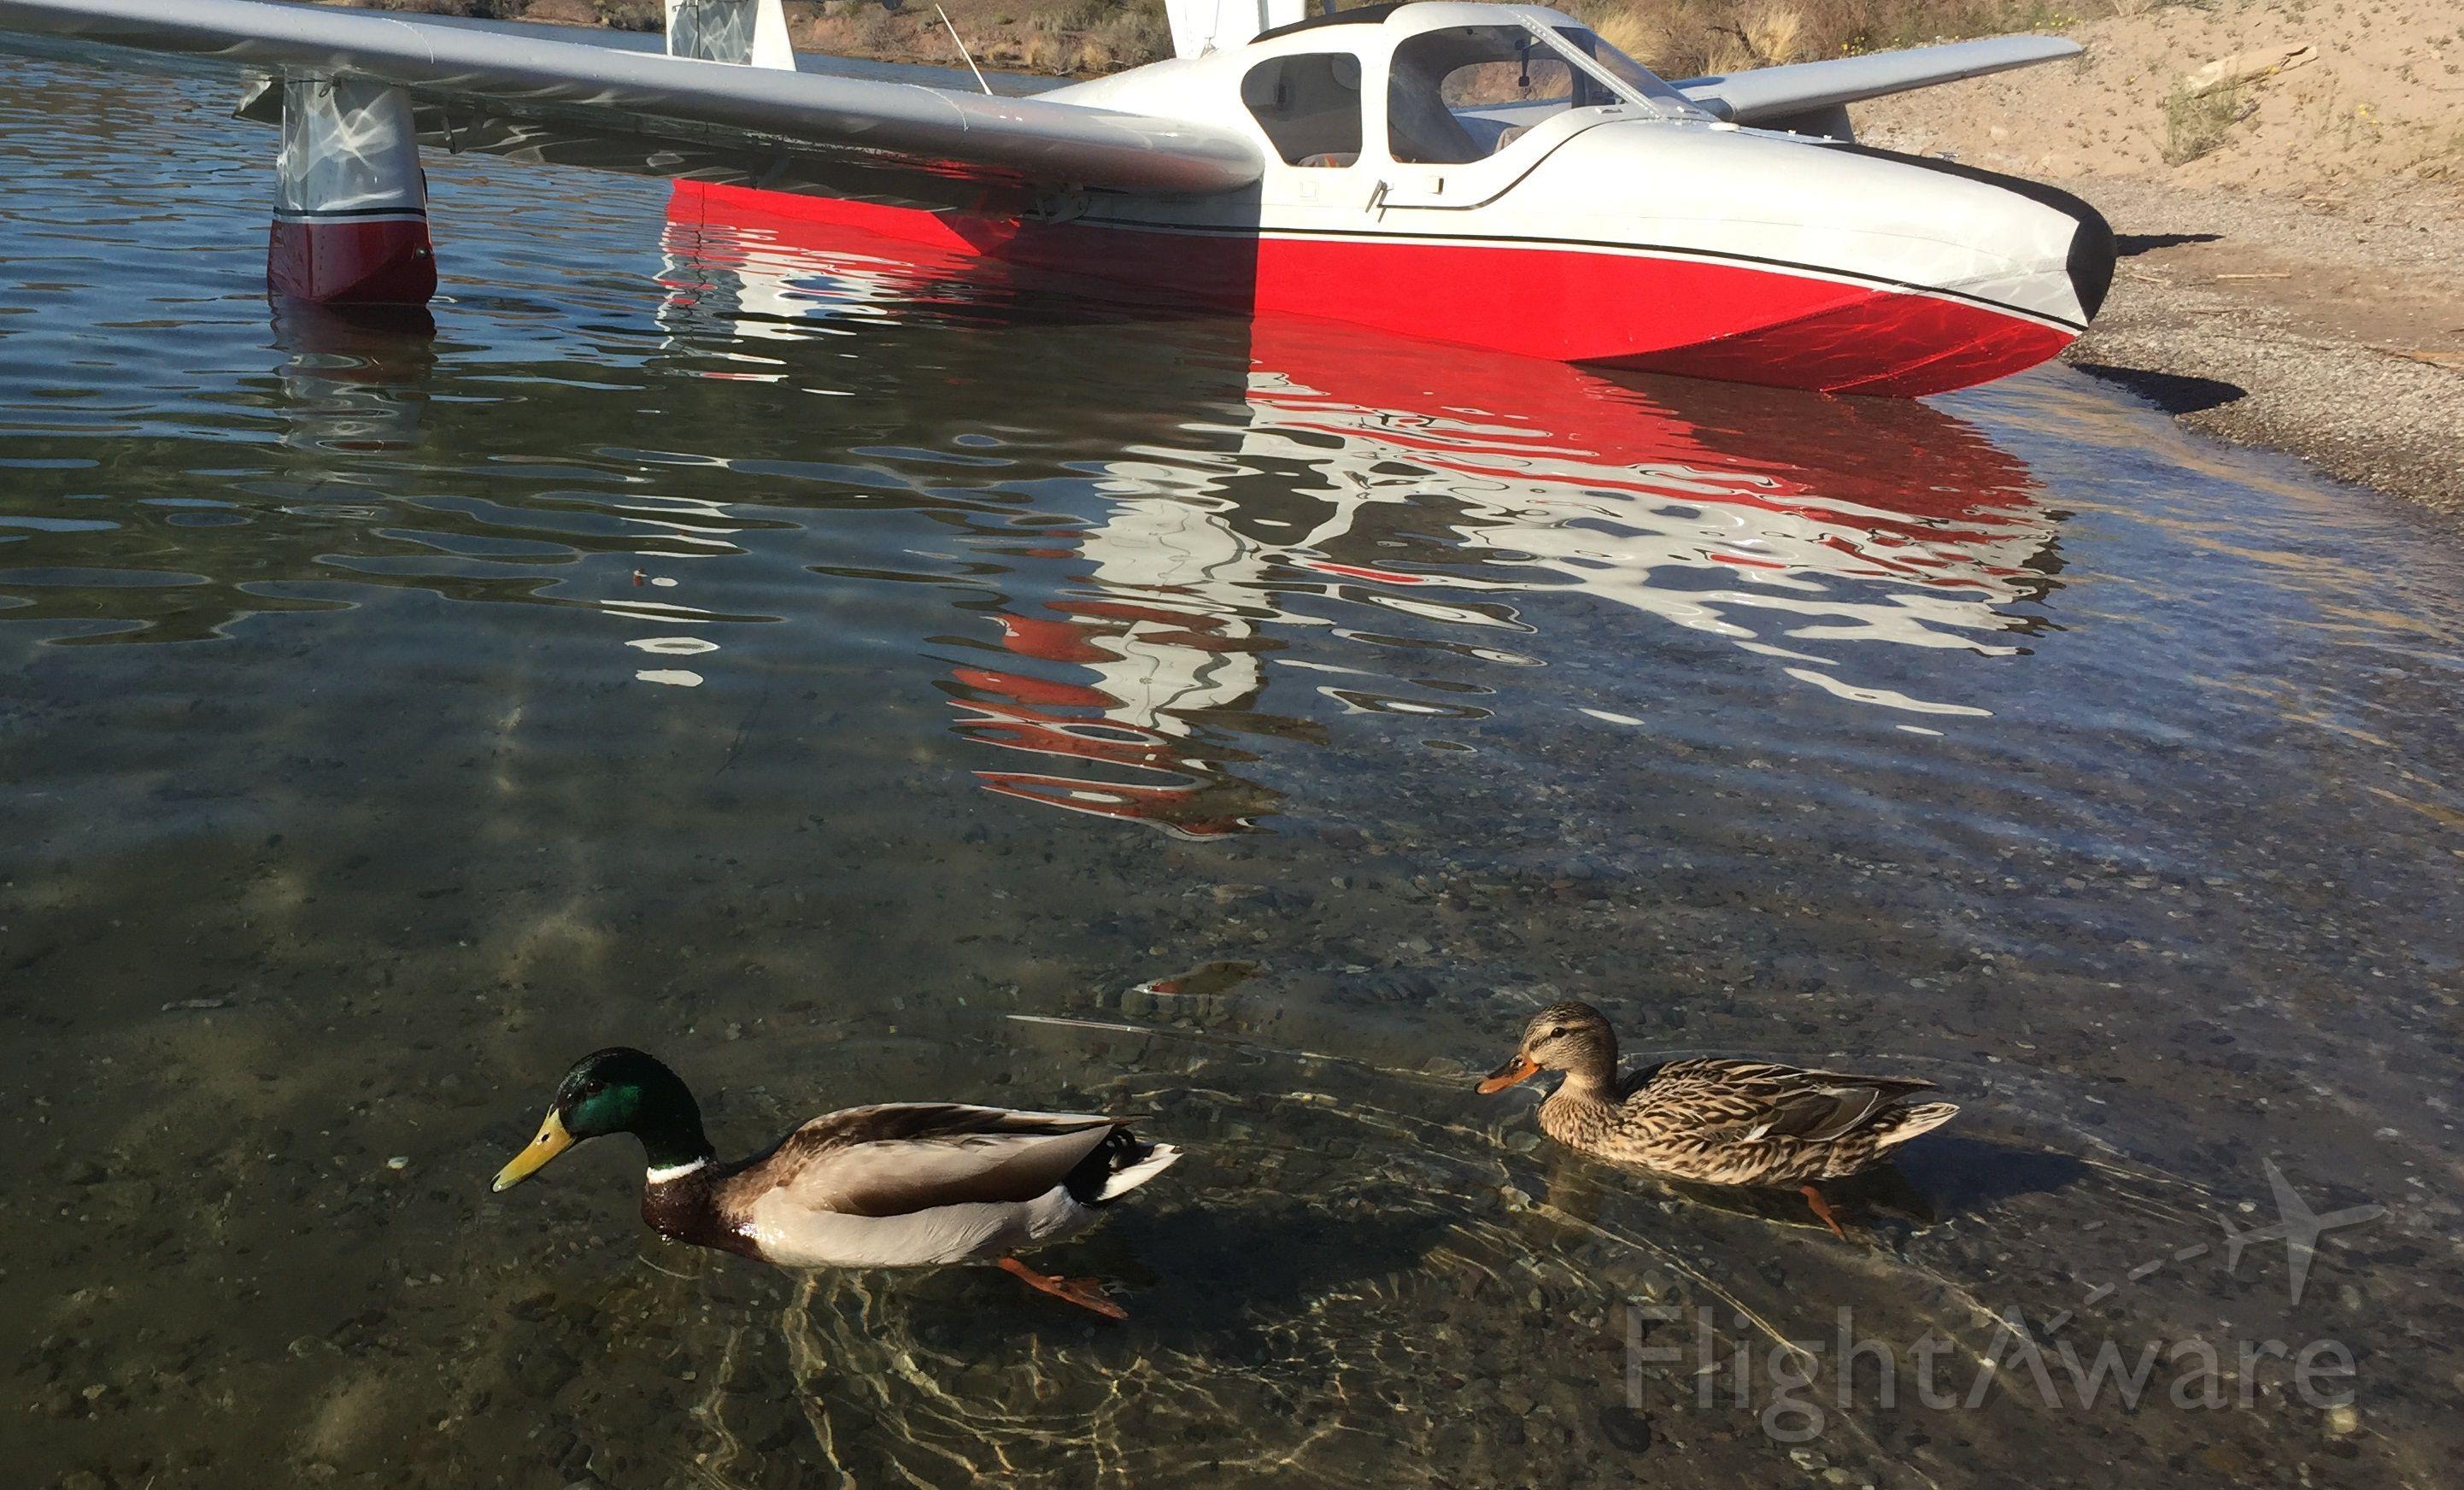 LAKE LA-200 (N7615L) - Three water birds, Lake Havasu, 2017